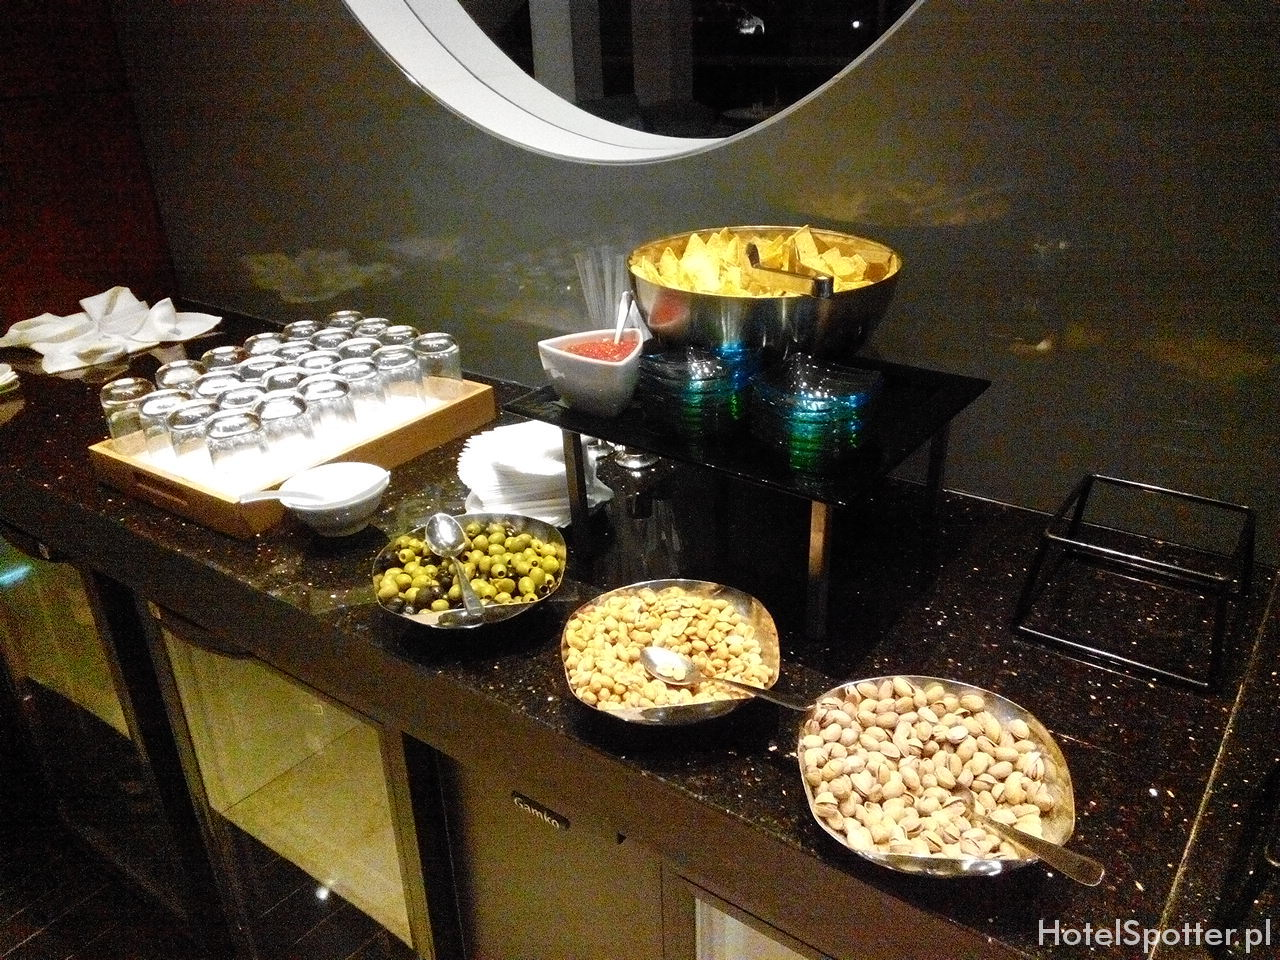 Executive Lounge w Hilton Warsaw - nachody i orzeszki